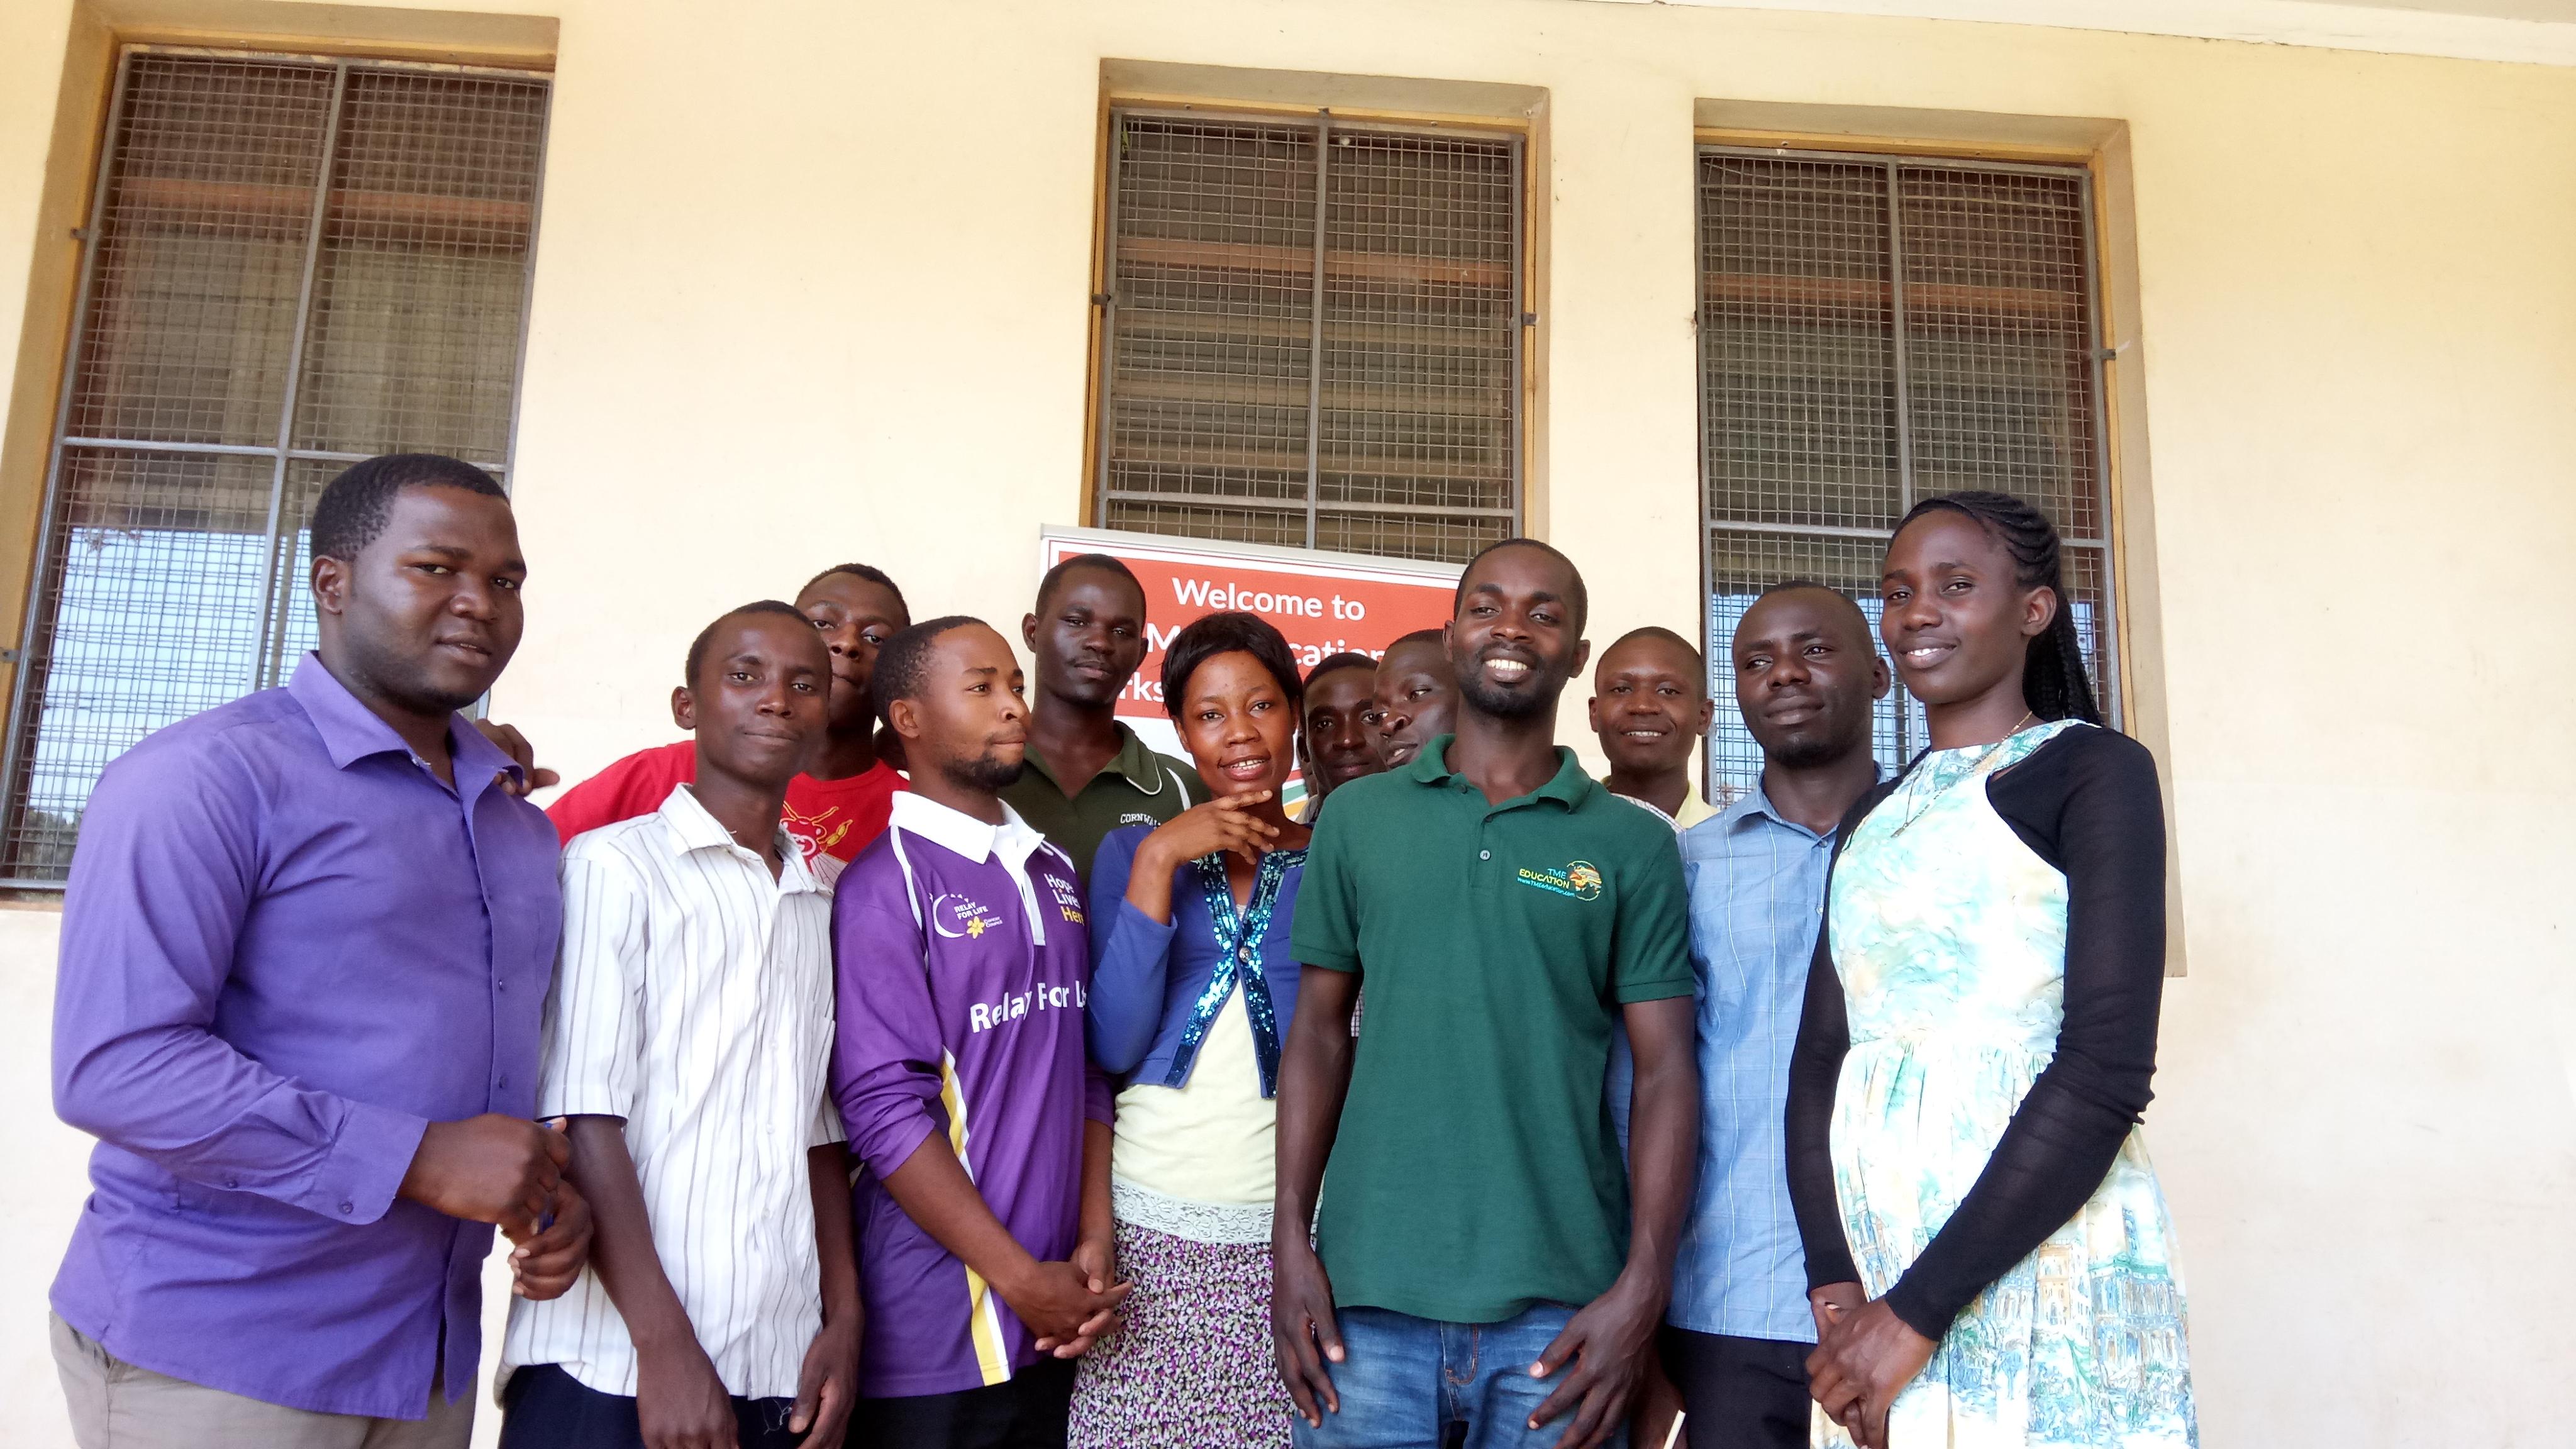 Report: Teacher Training at Jinja Vocational Training Centre, Uganda (October 2018).